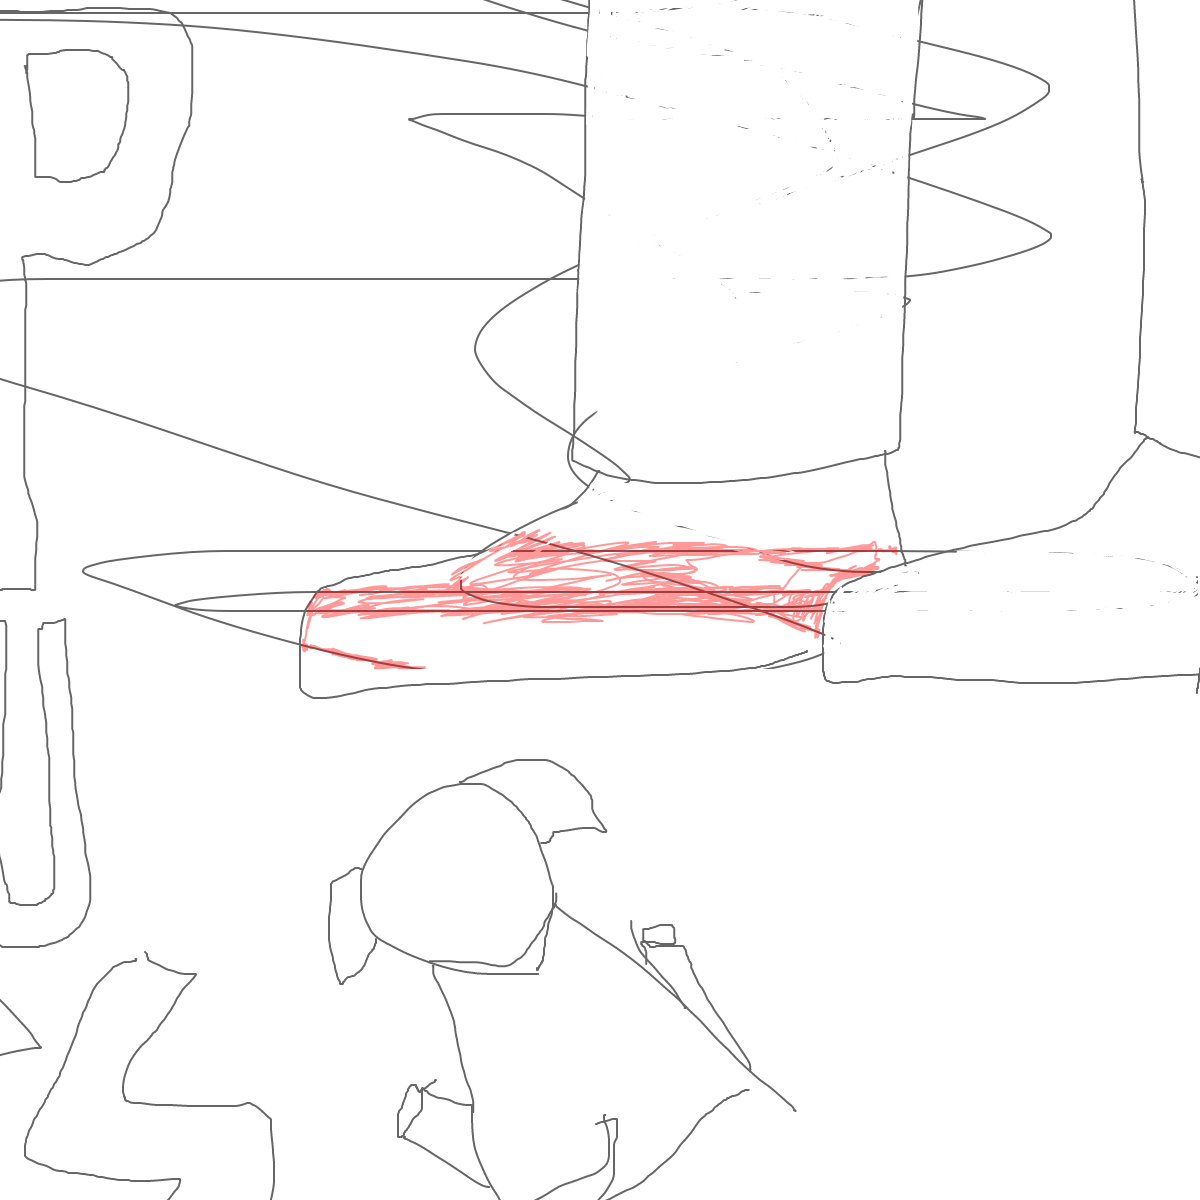 BAAAM drawing#16126 lat:52.4753227233886700lng: 13.4063282012939450